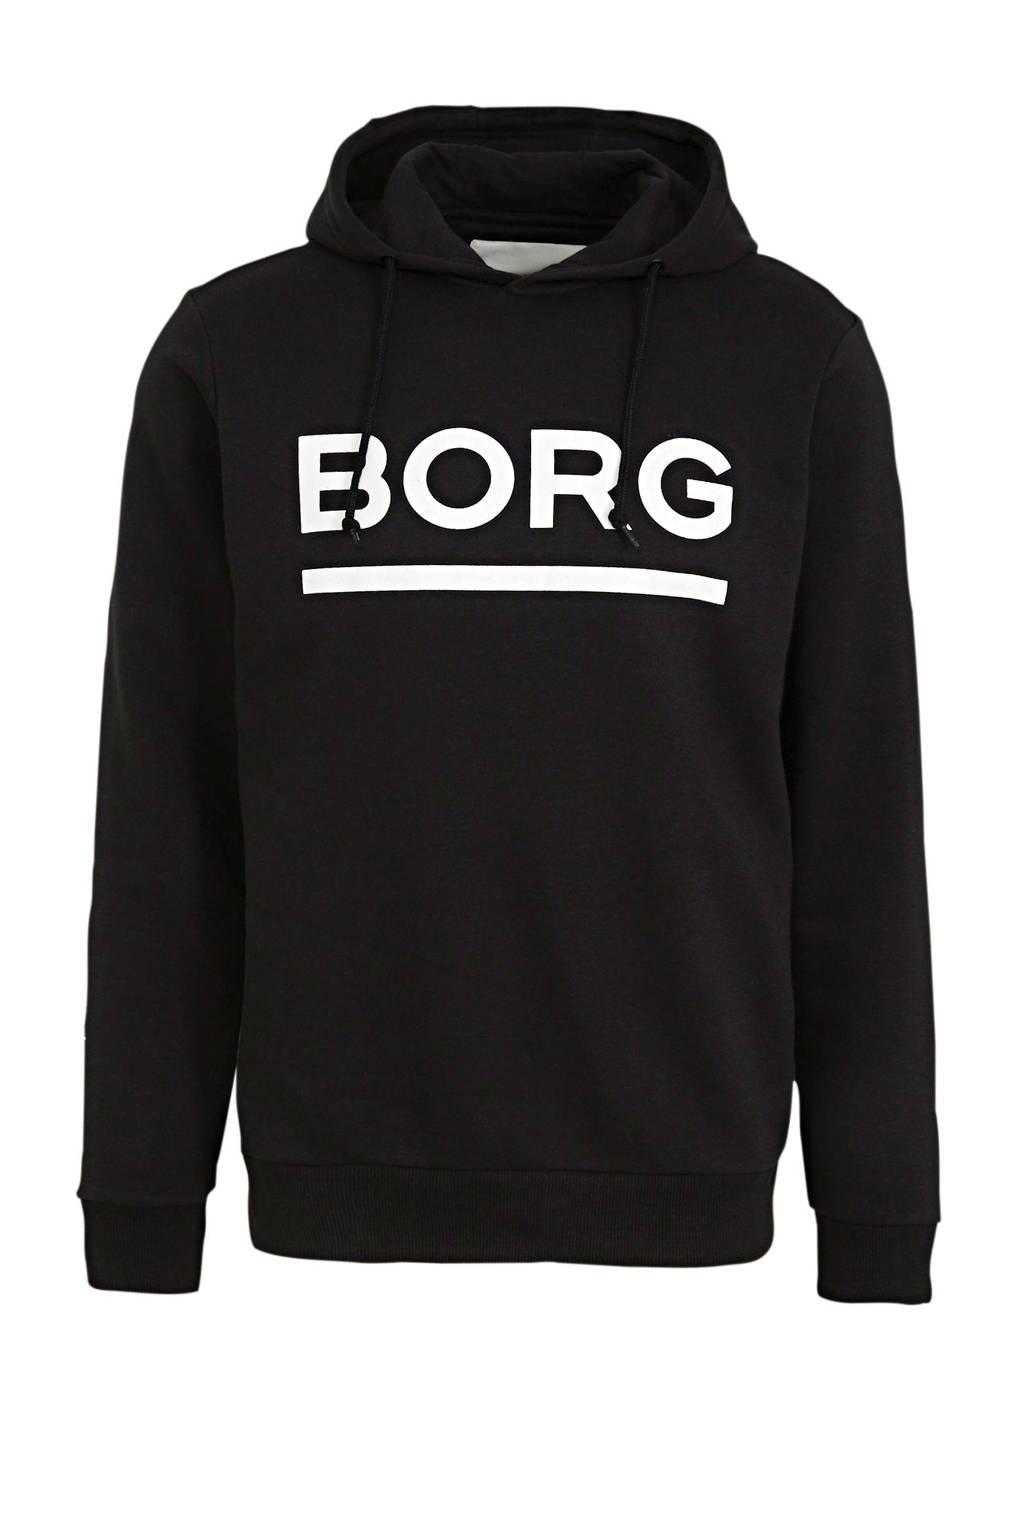 Björn Borg   hoodie zwart, Zwart